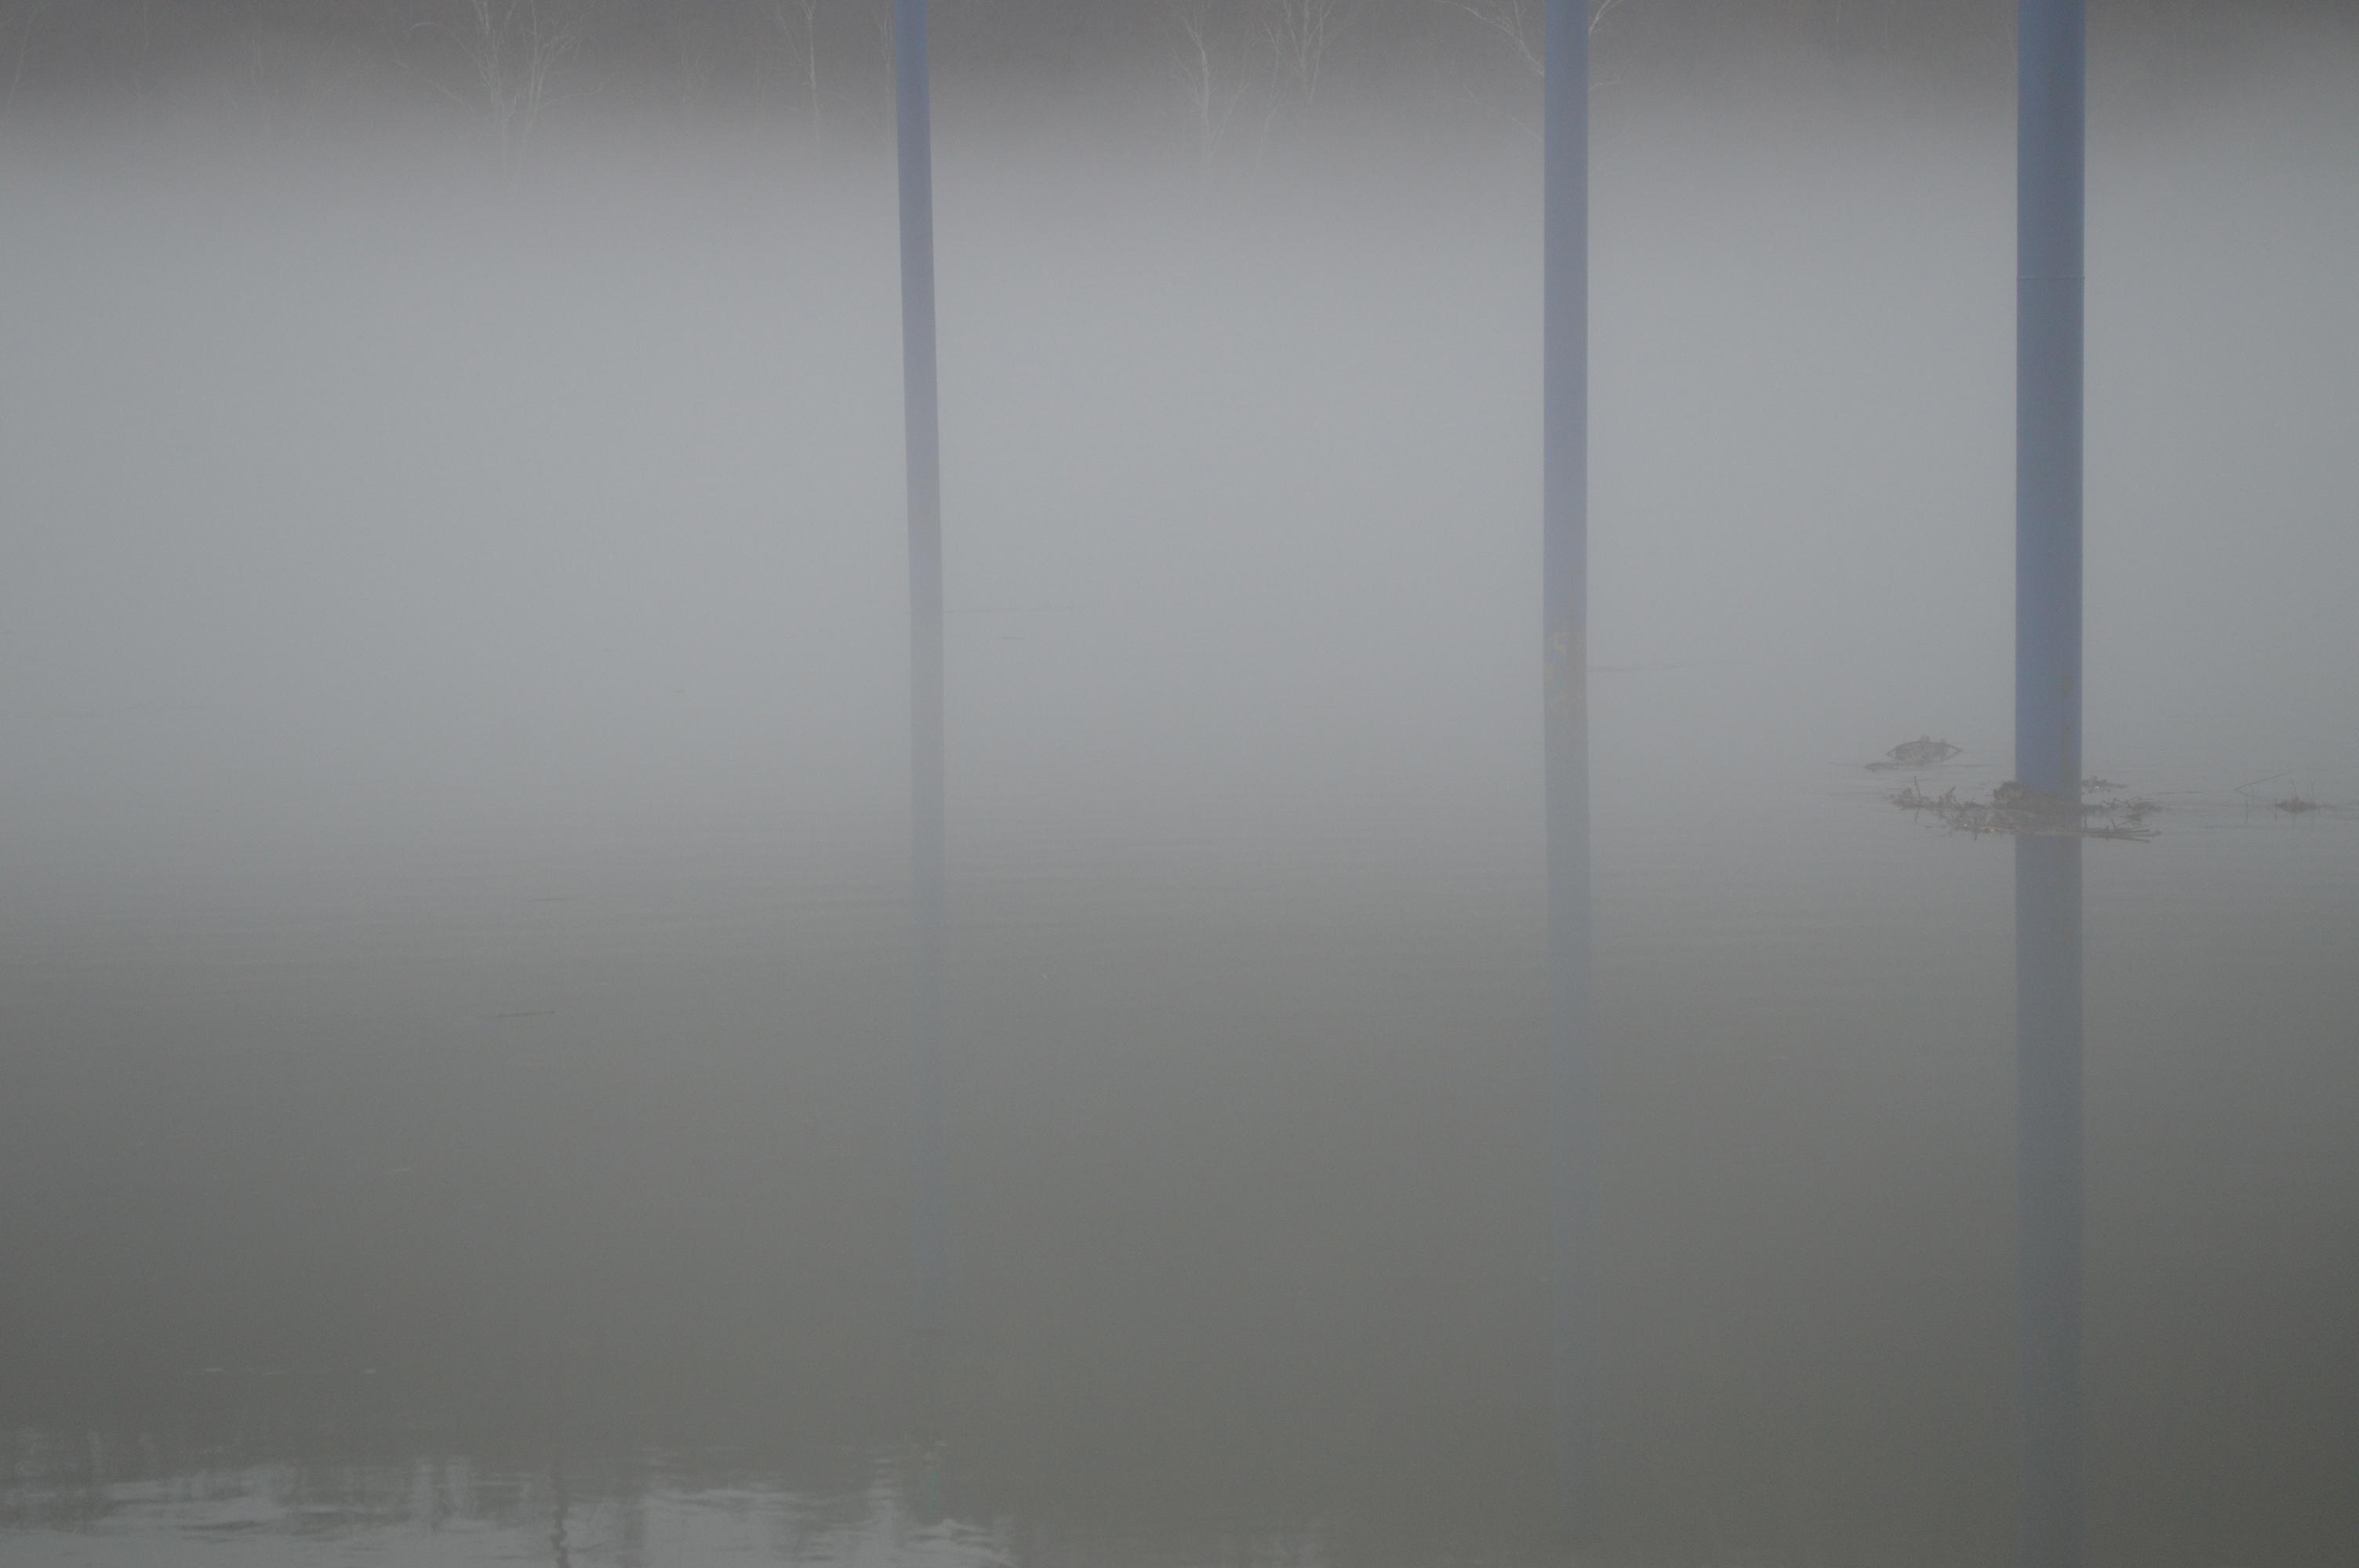 fog on the river w blue poles